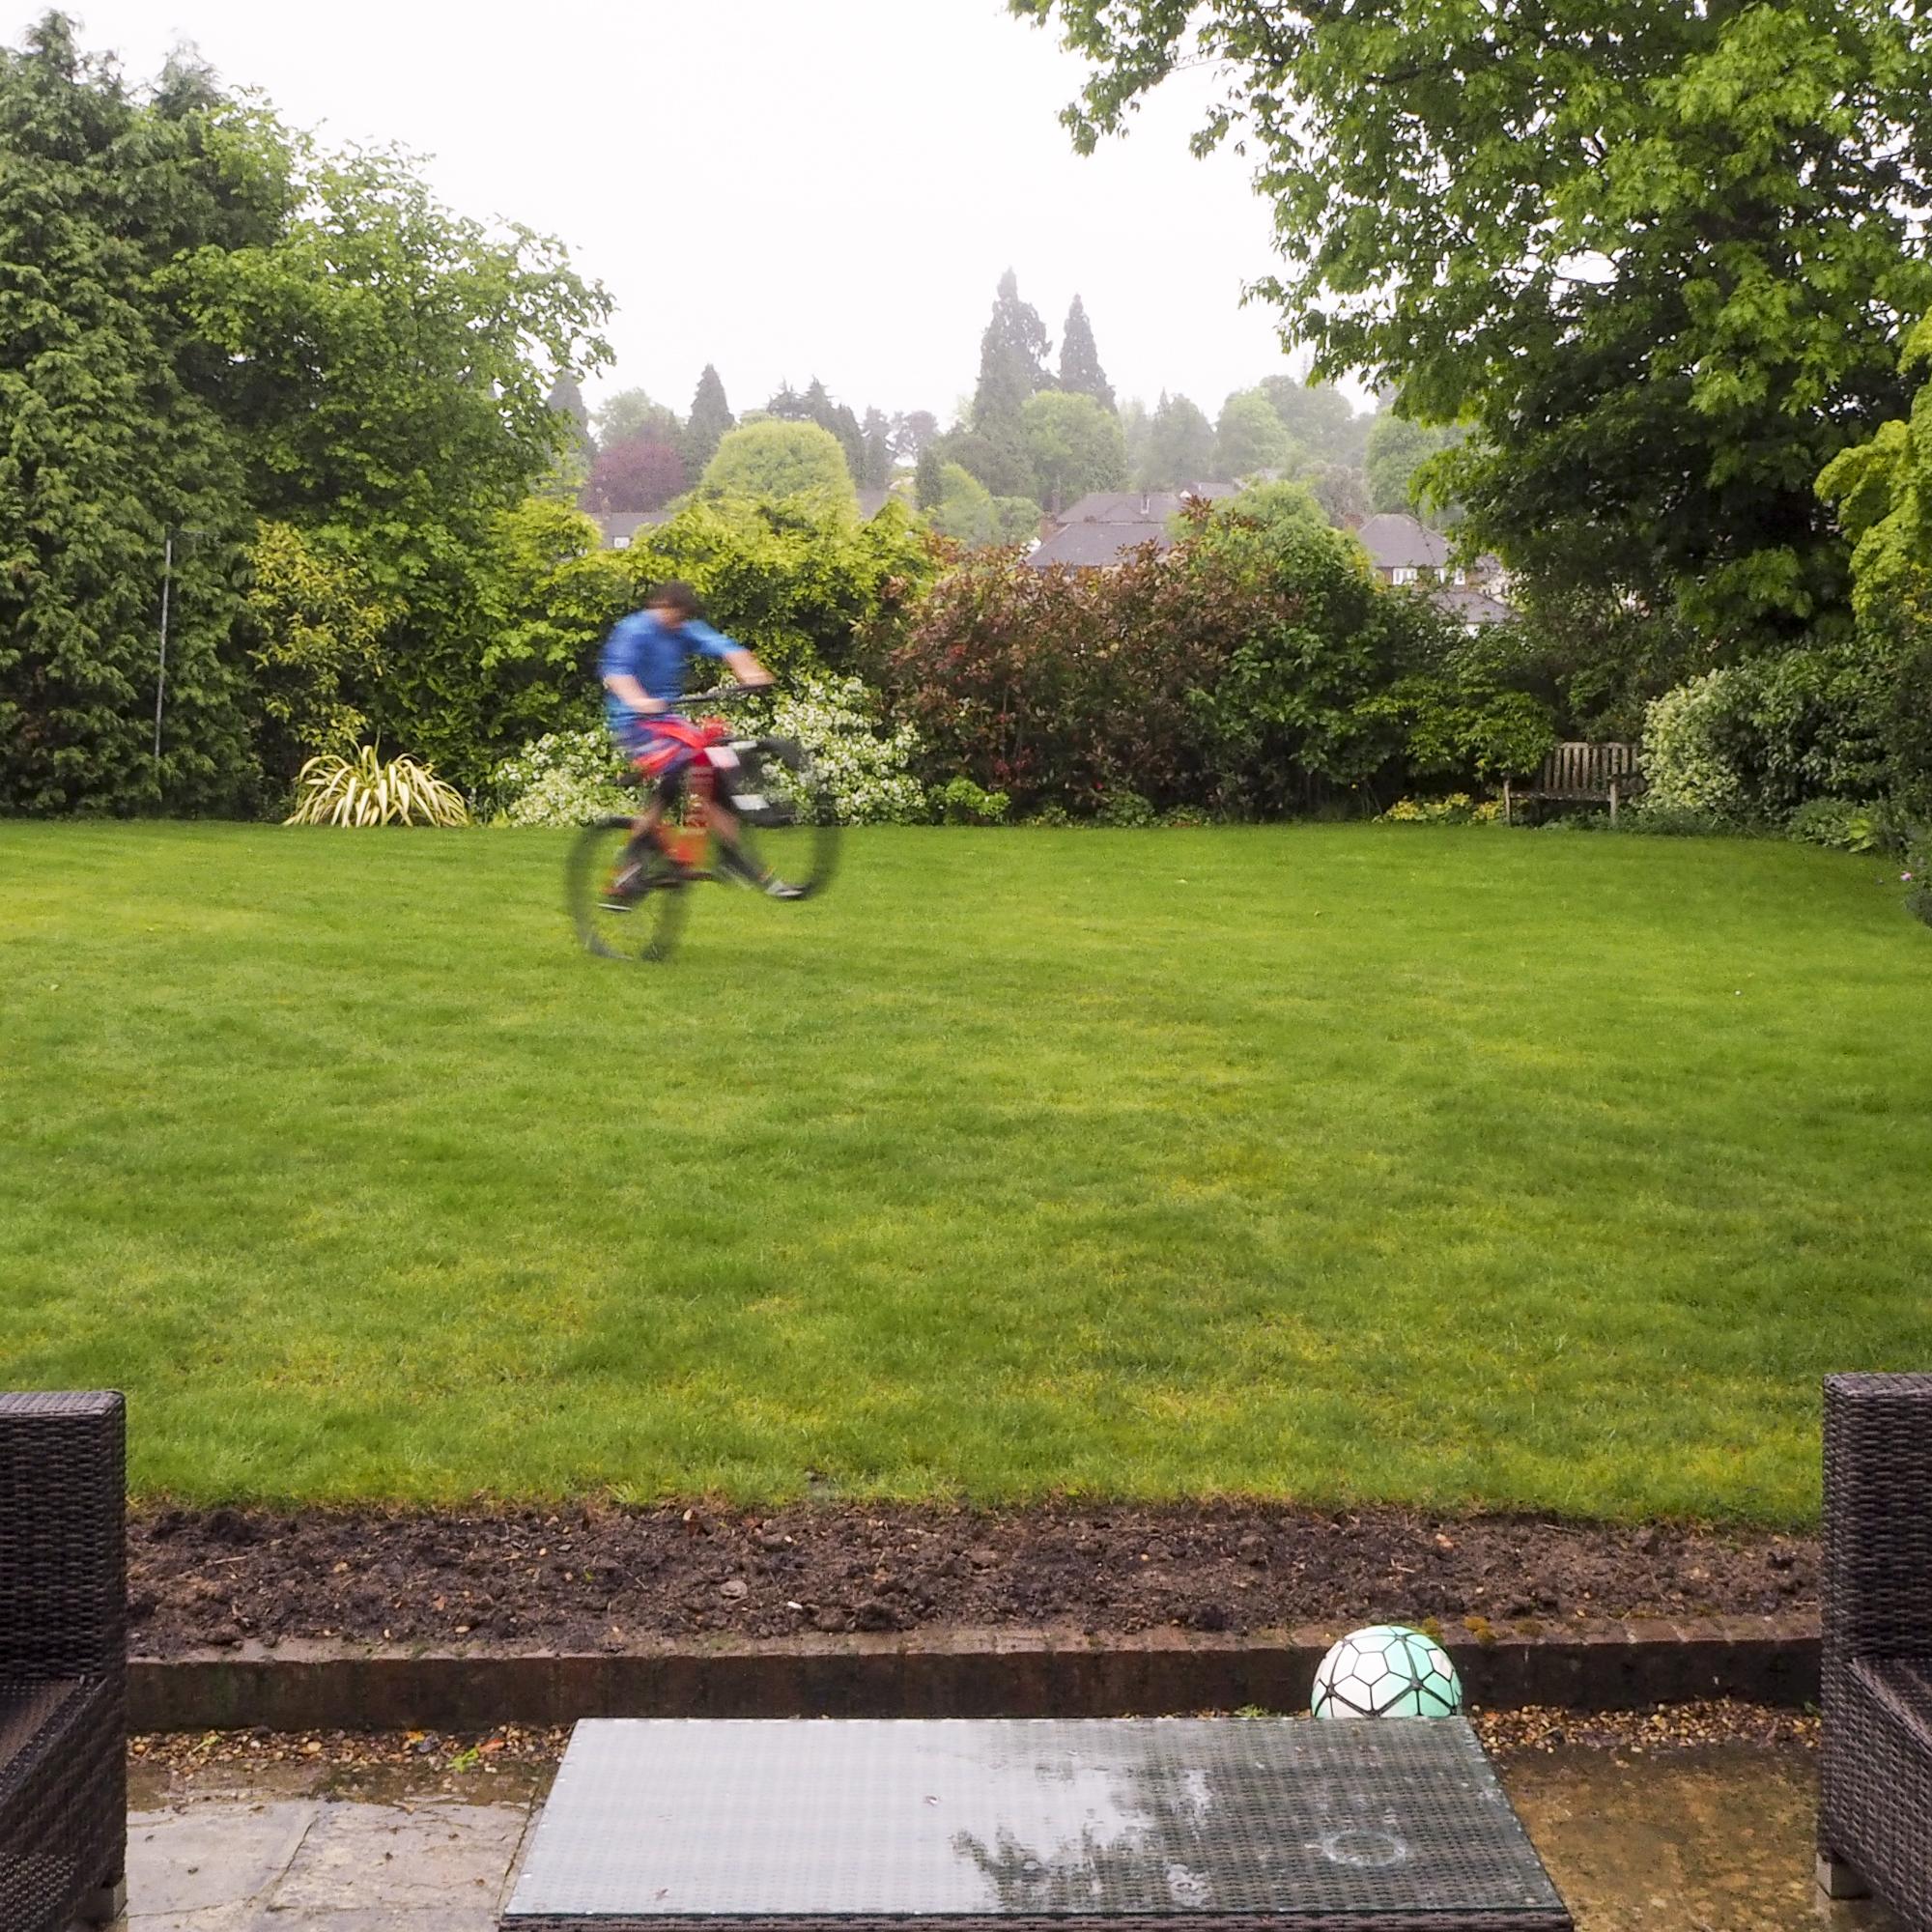 sally-hornung-photpgraphy-garden-bike-moving.jpg